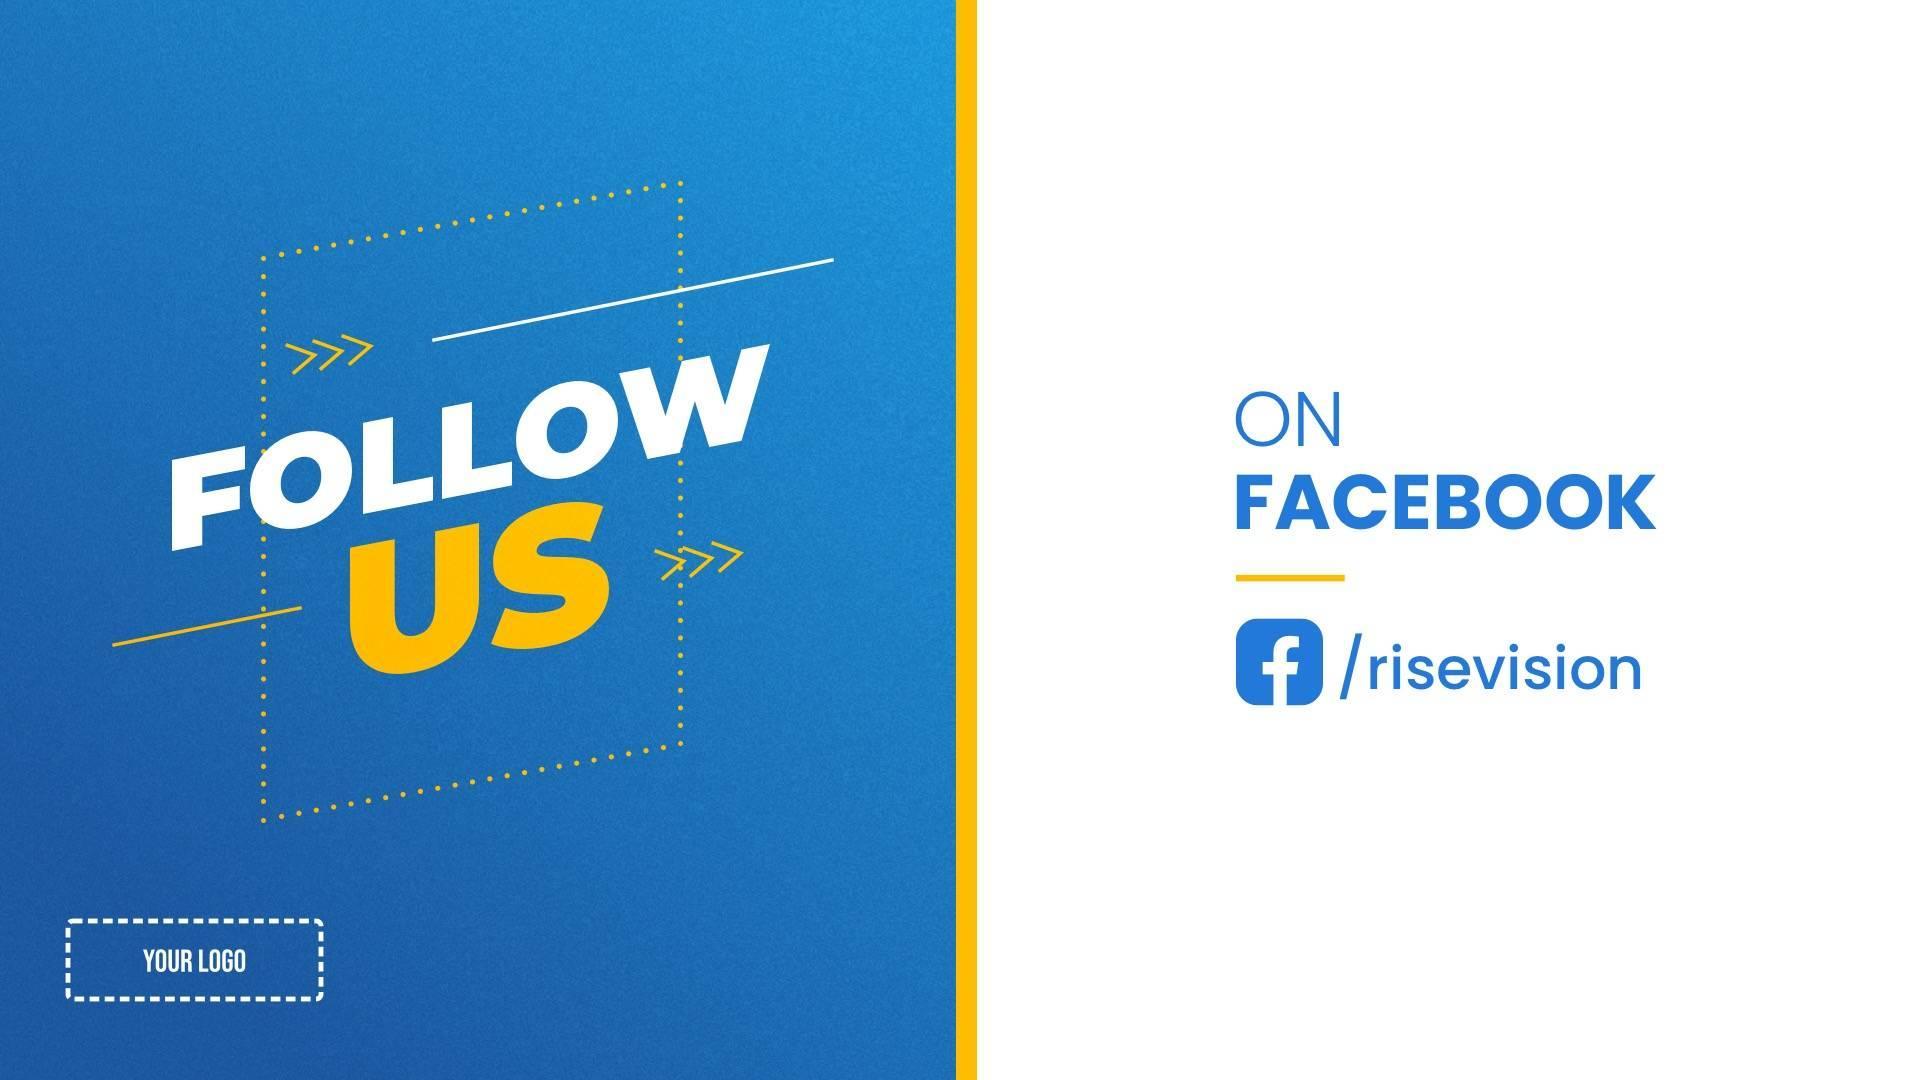 Follow Us on Facebook Digital Signage Template